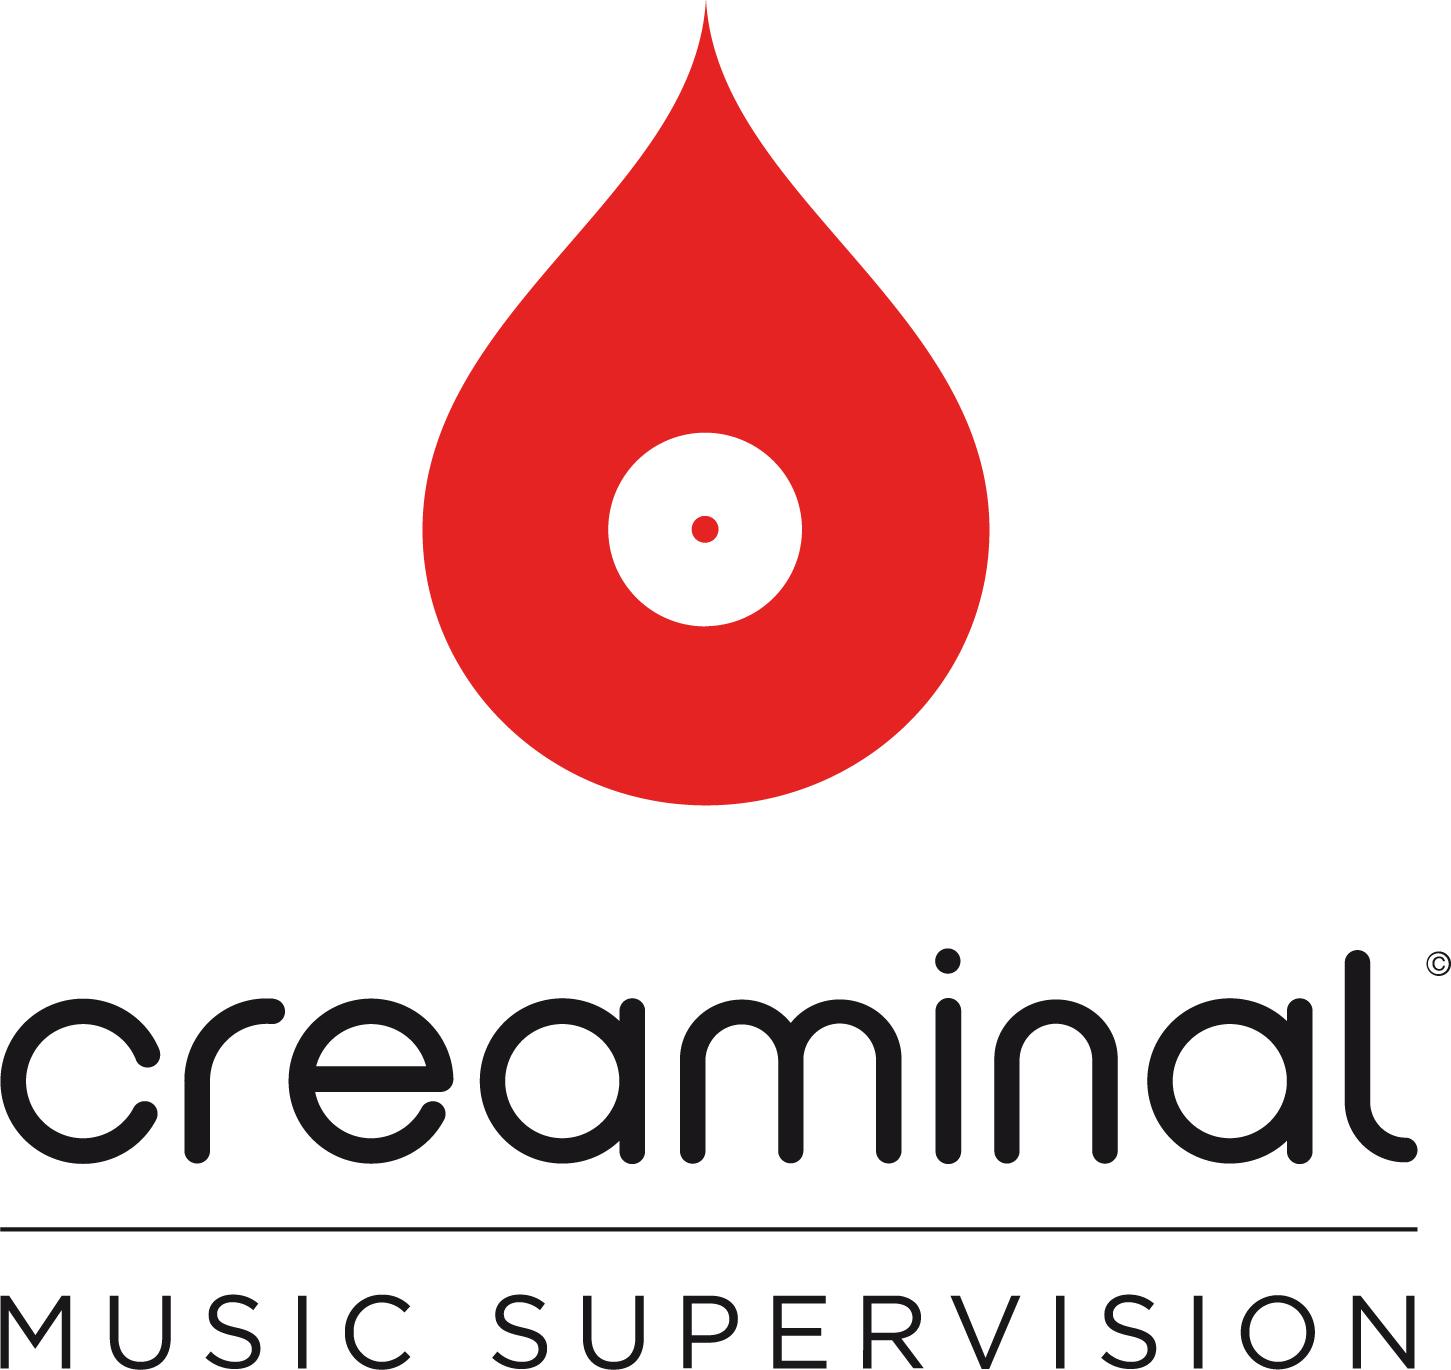 Creaminal logo